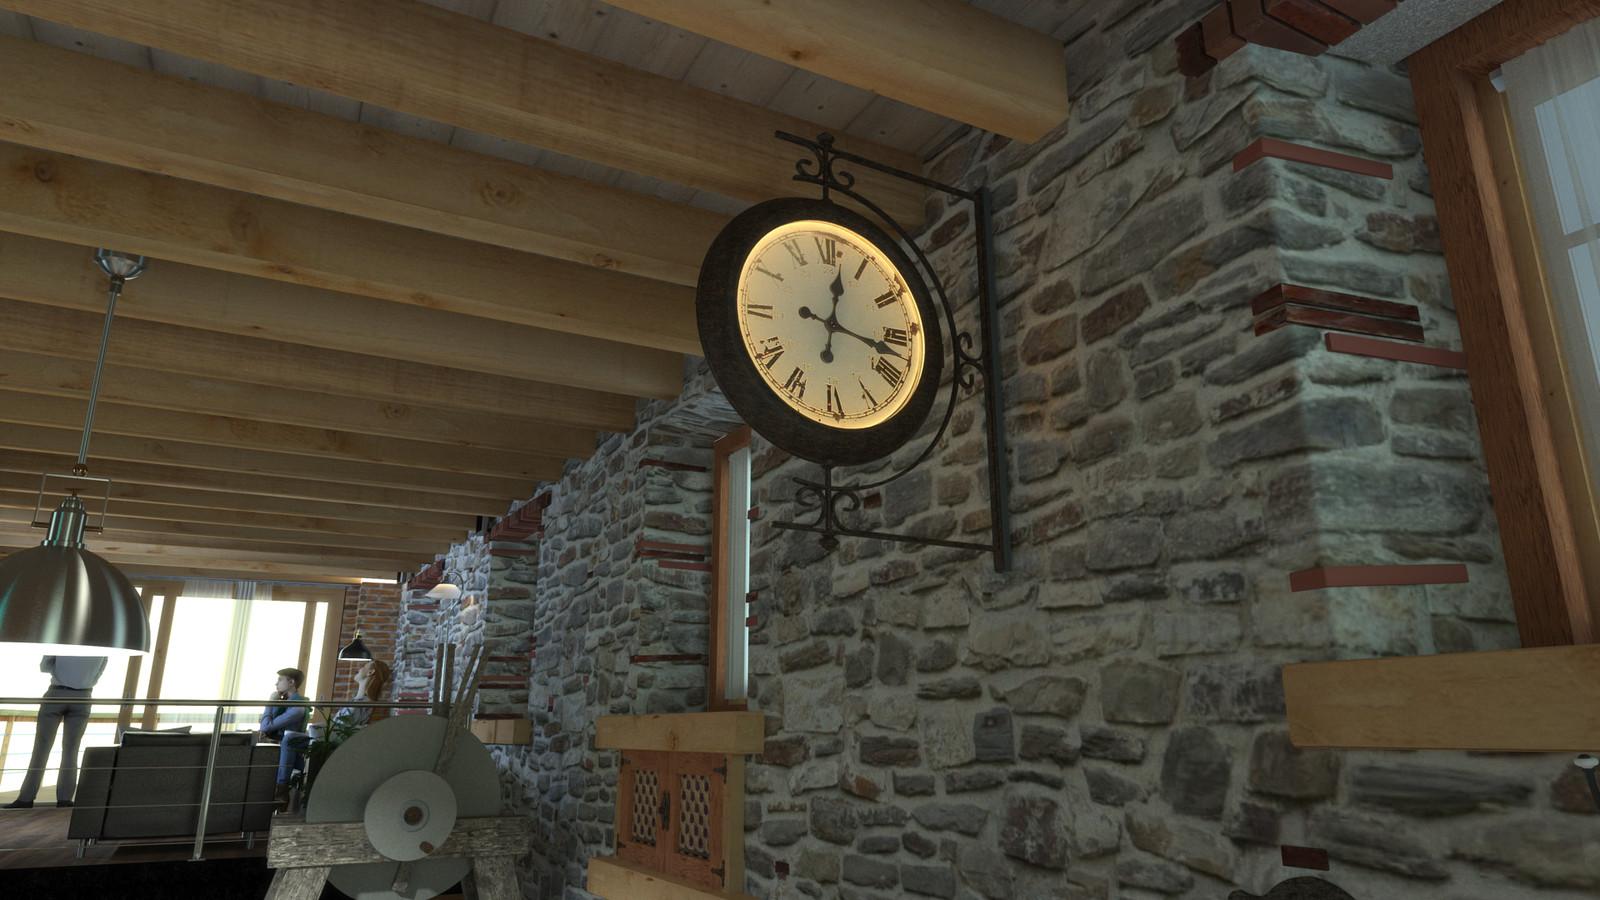 SketchUp + Thea Render  Moulin de Rivendell ( Rivendell Mill )'s Wall Clock Scene 14 Lighting test